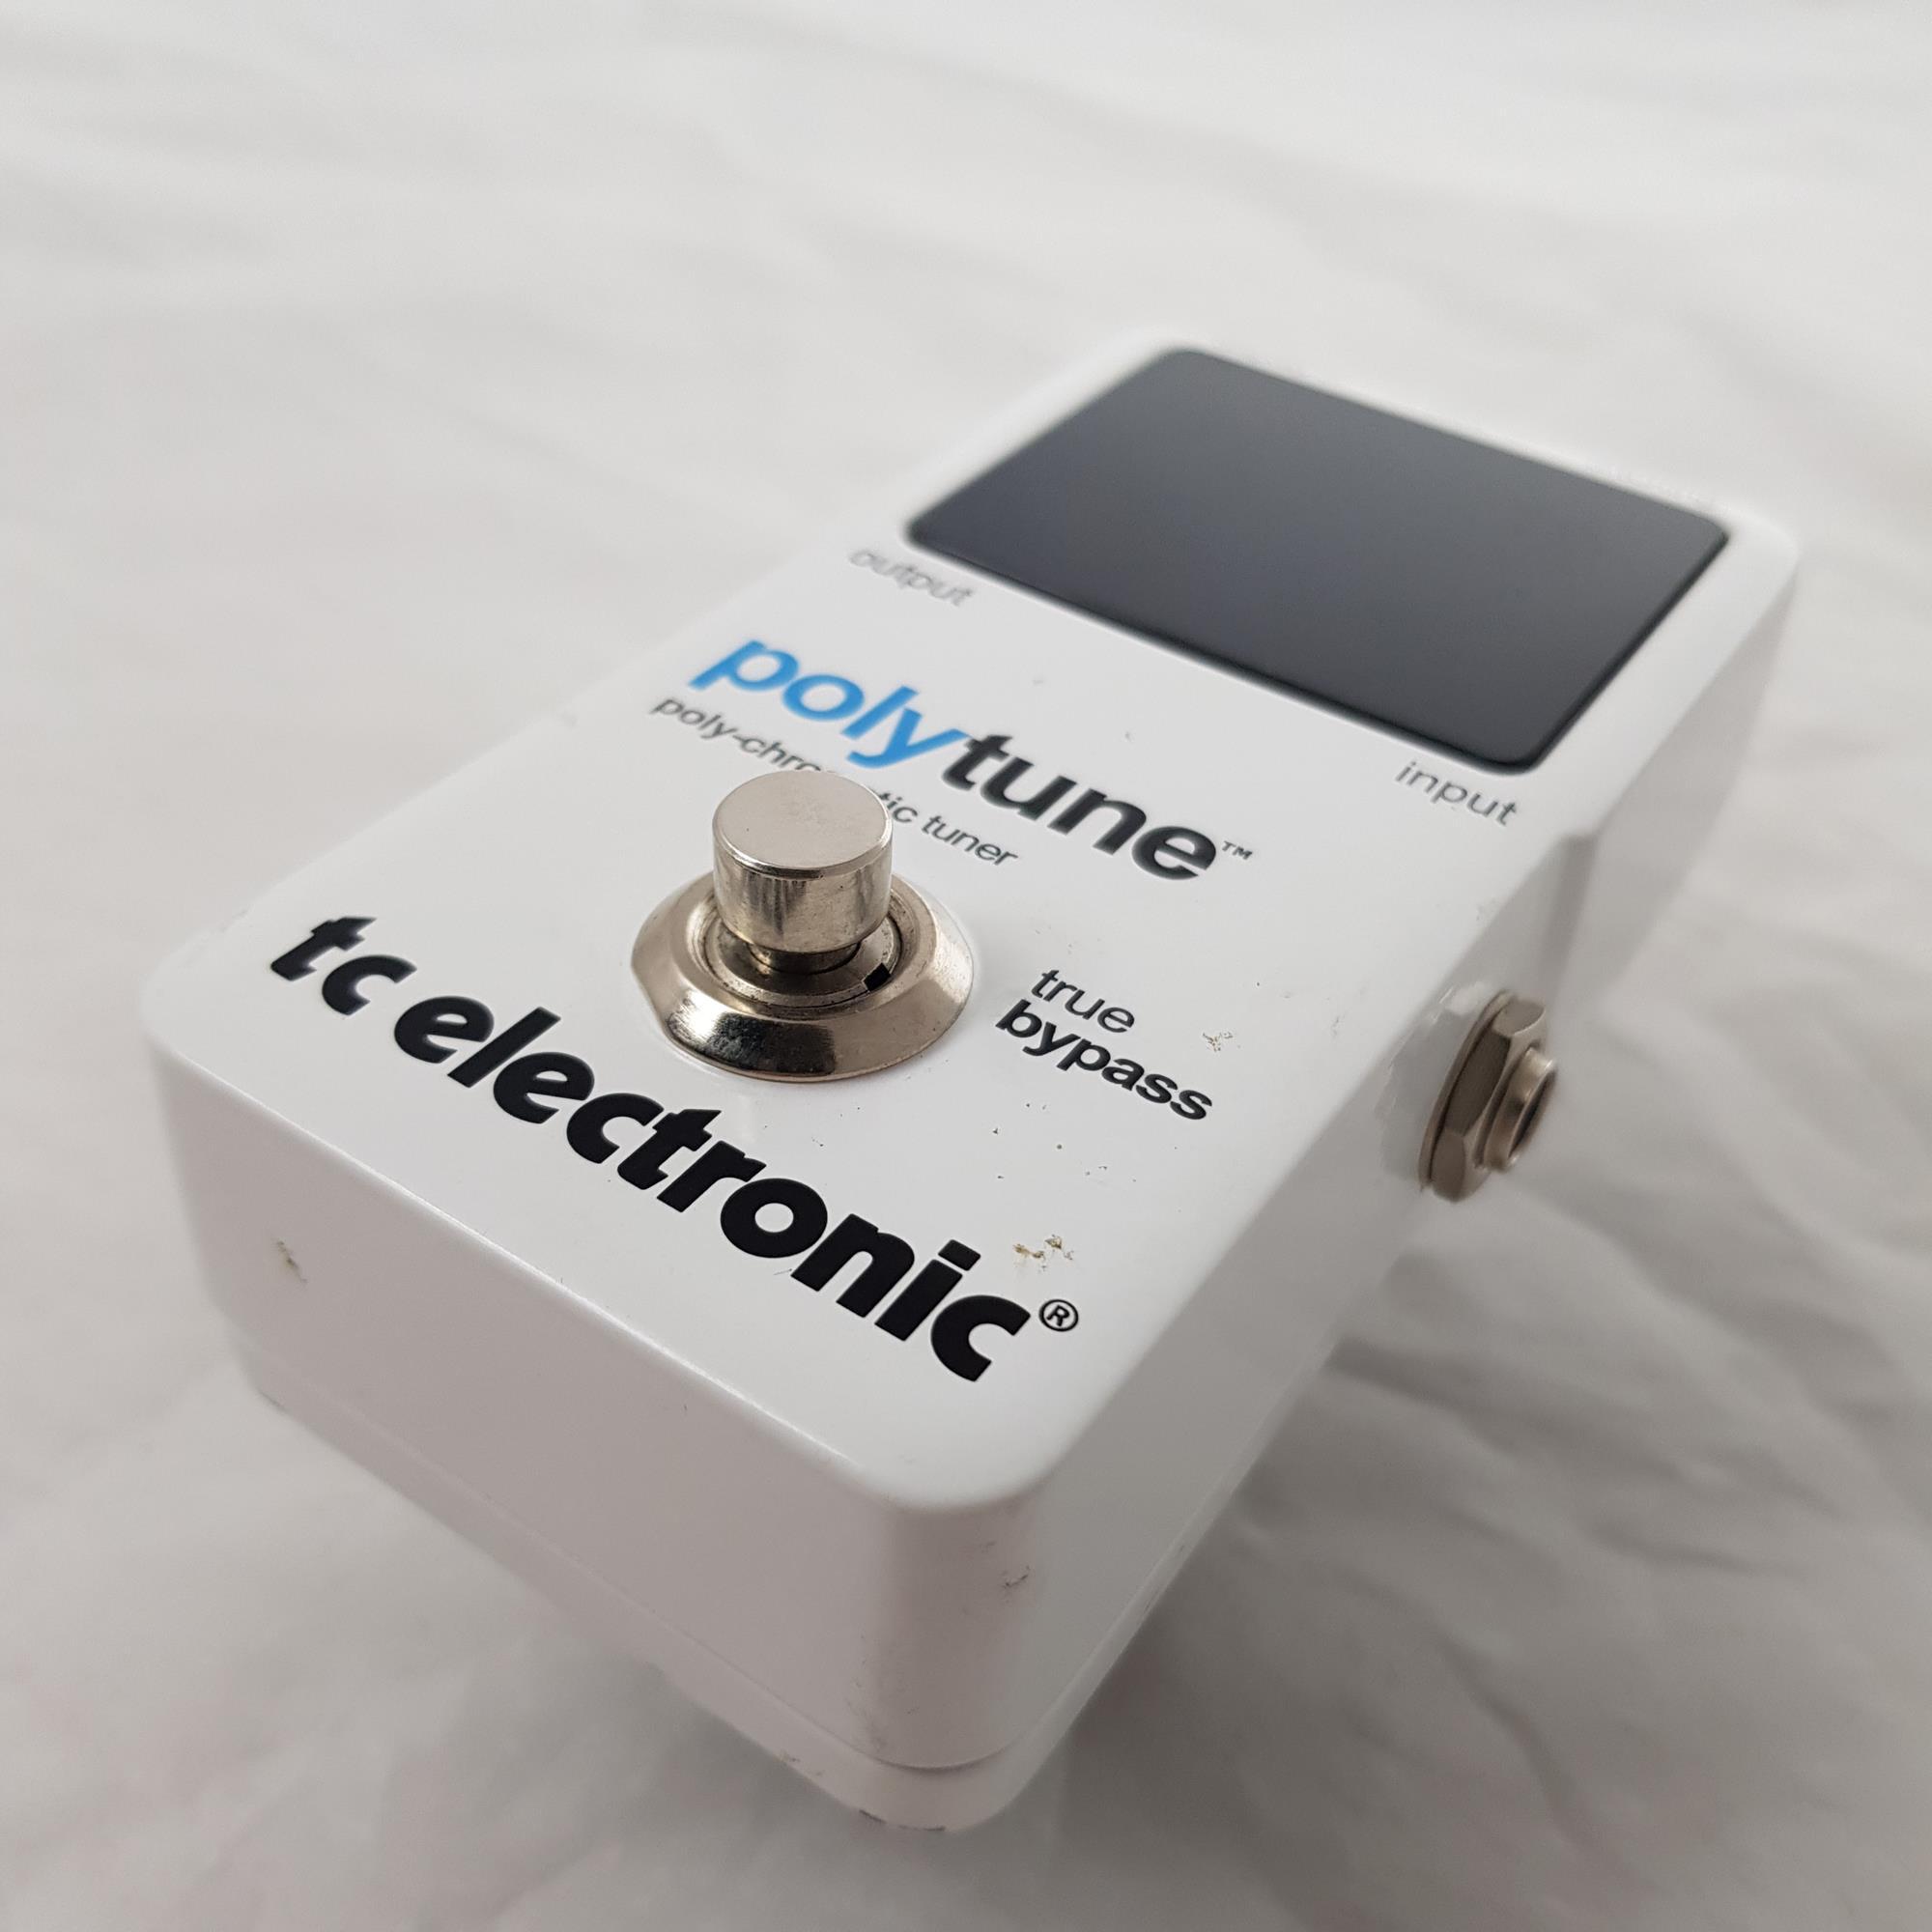 TC-ELECTRONIC-POLYTUNE-sku-1624117118118